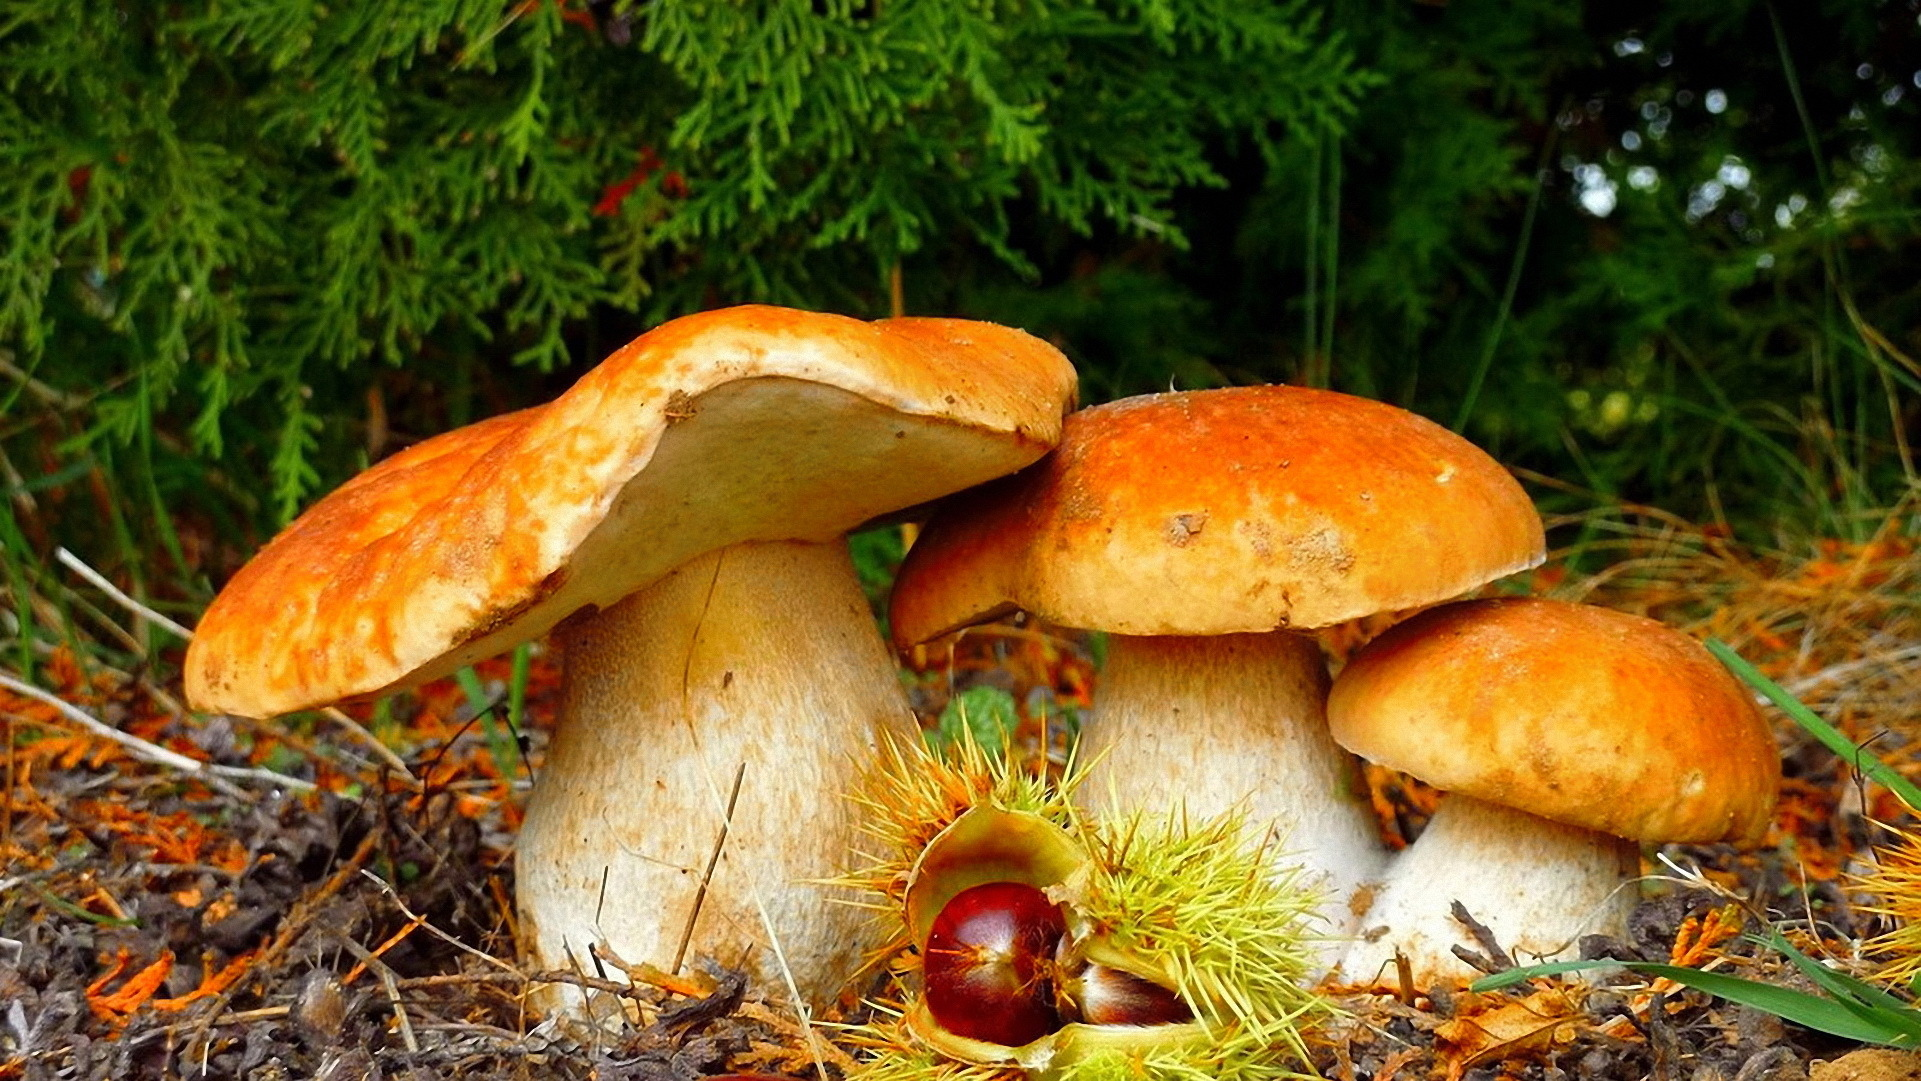 Mushroom Hd Wallpaper Background Image 1921x1081 Id